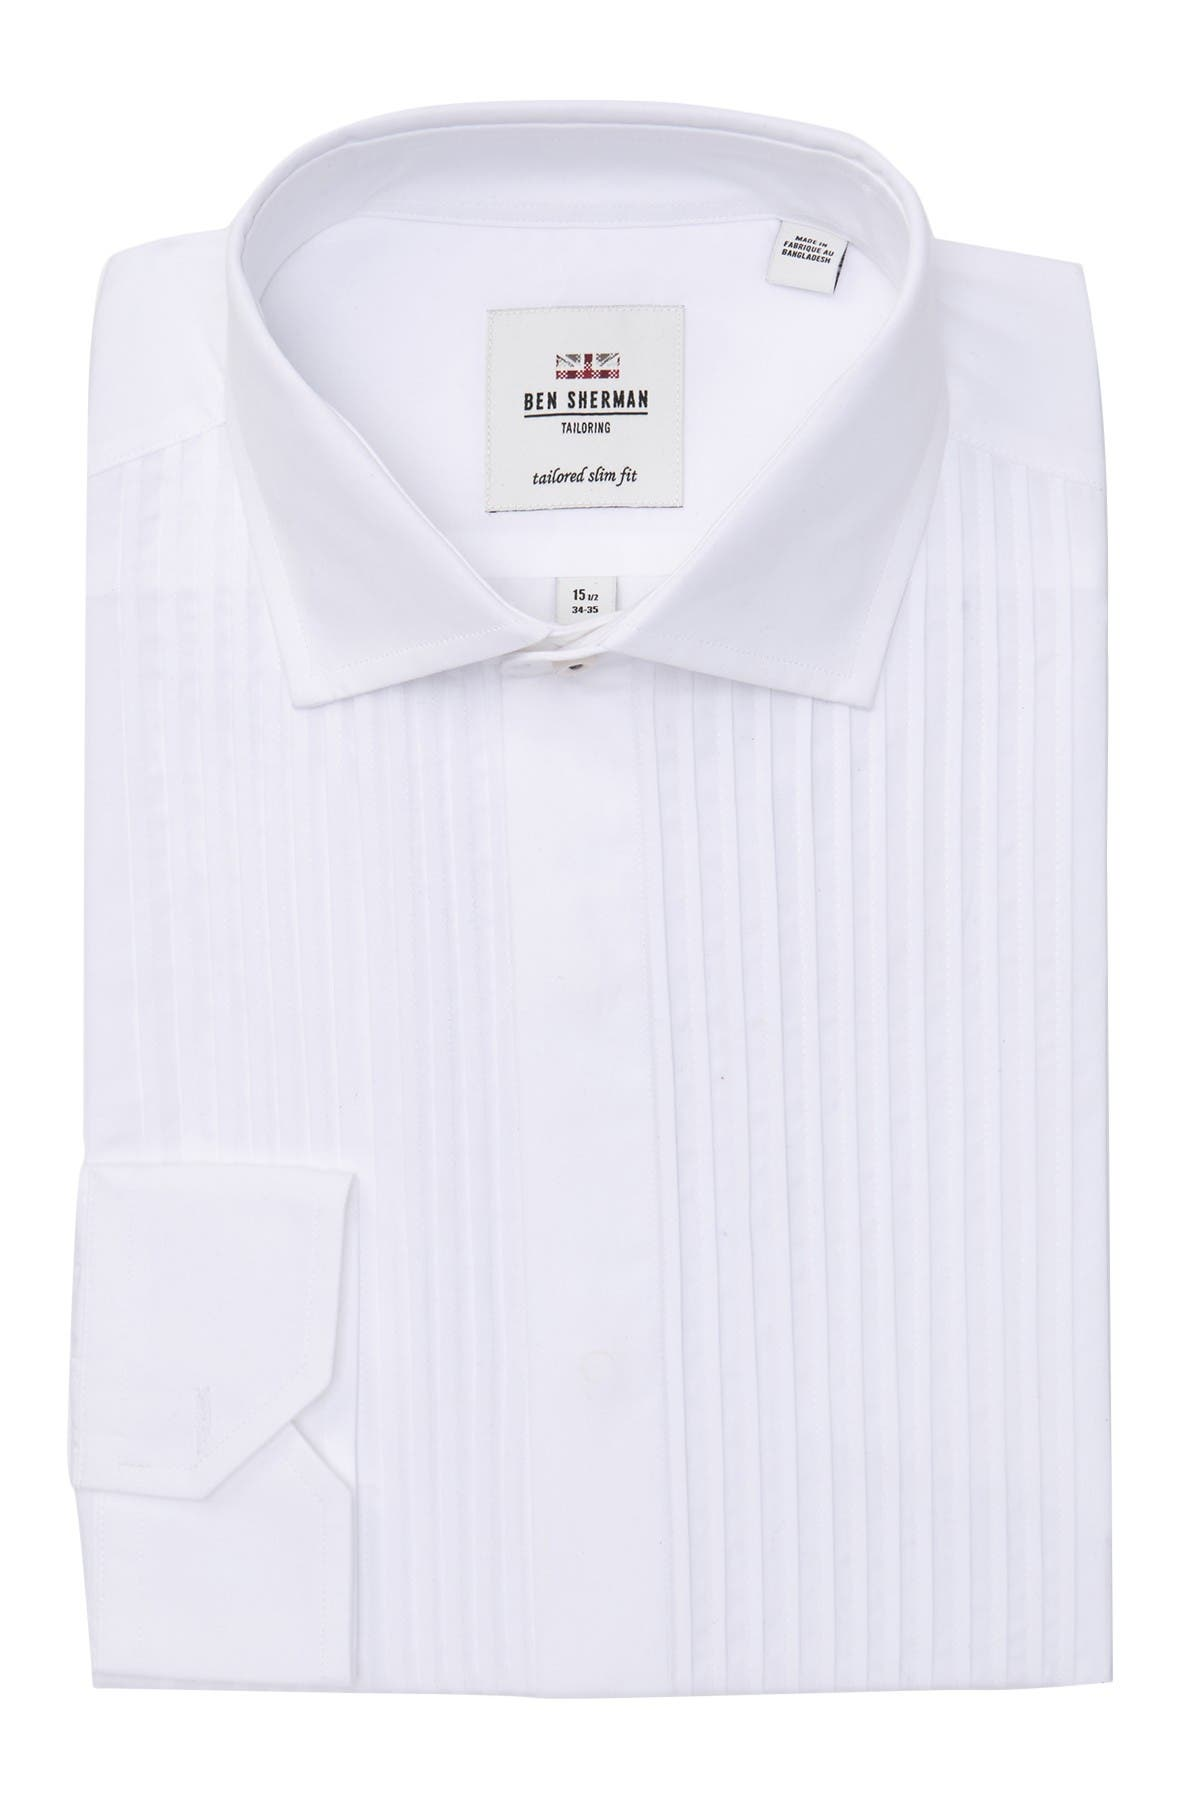 Aplaudir Marina Reclamación  Ben Sherman | Dinner Tux Tailored Slim Fit Dress Shirt | Nordstrom Rack